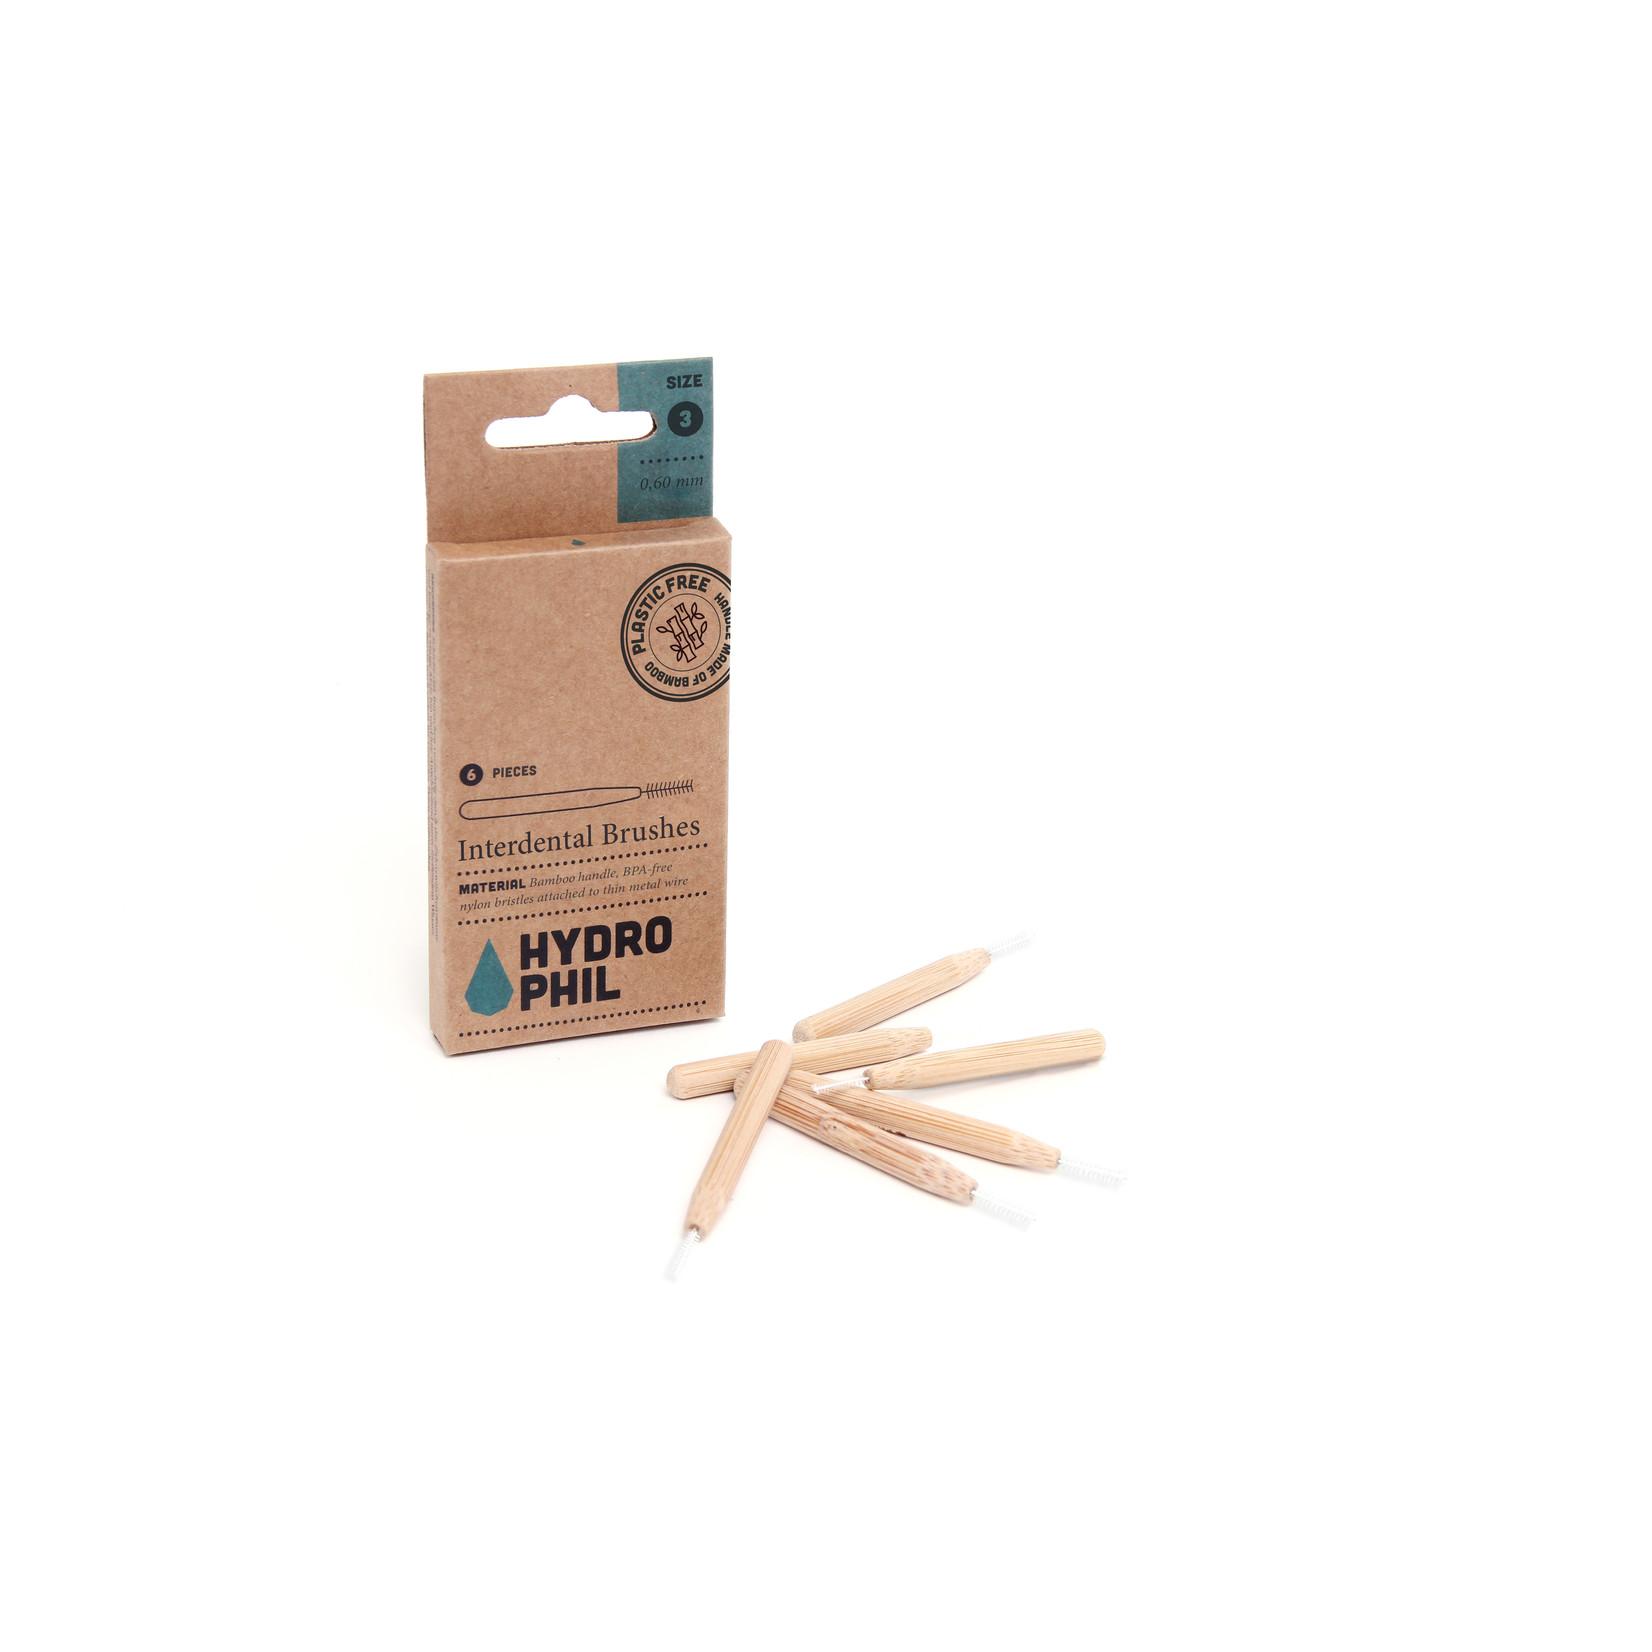 Hydrophil HYDROPHIL Interdental Brushes - Bamboo & BPA-free Nylon